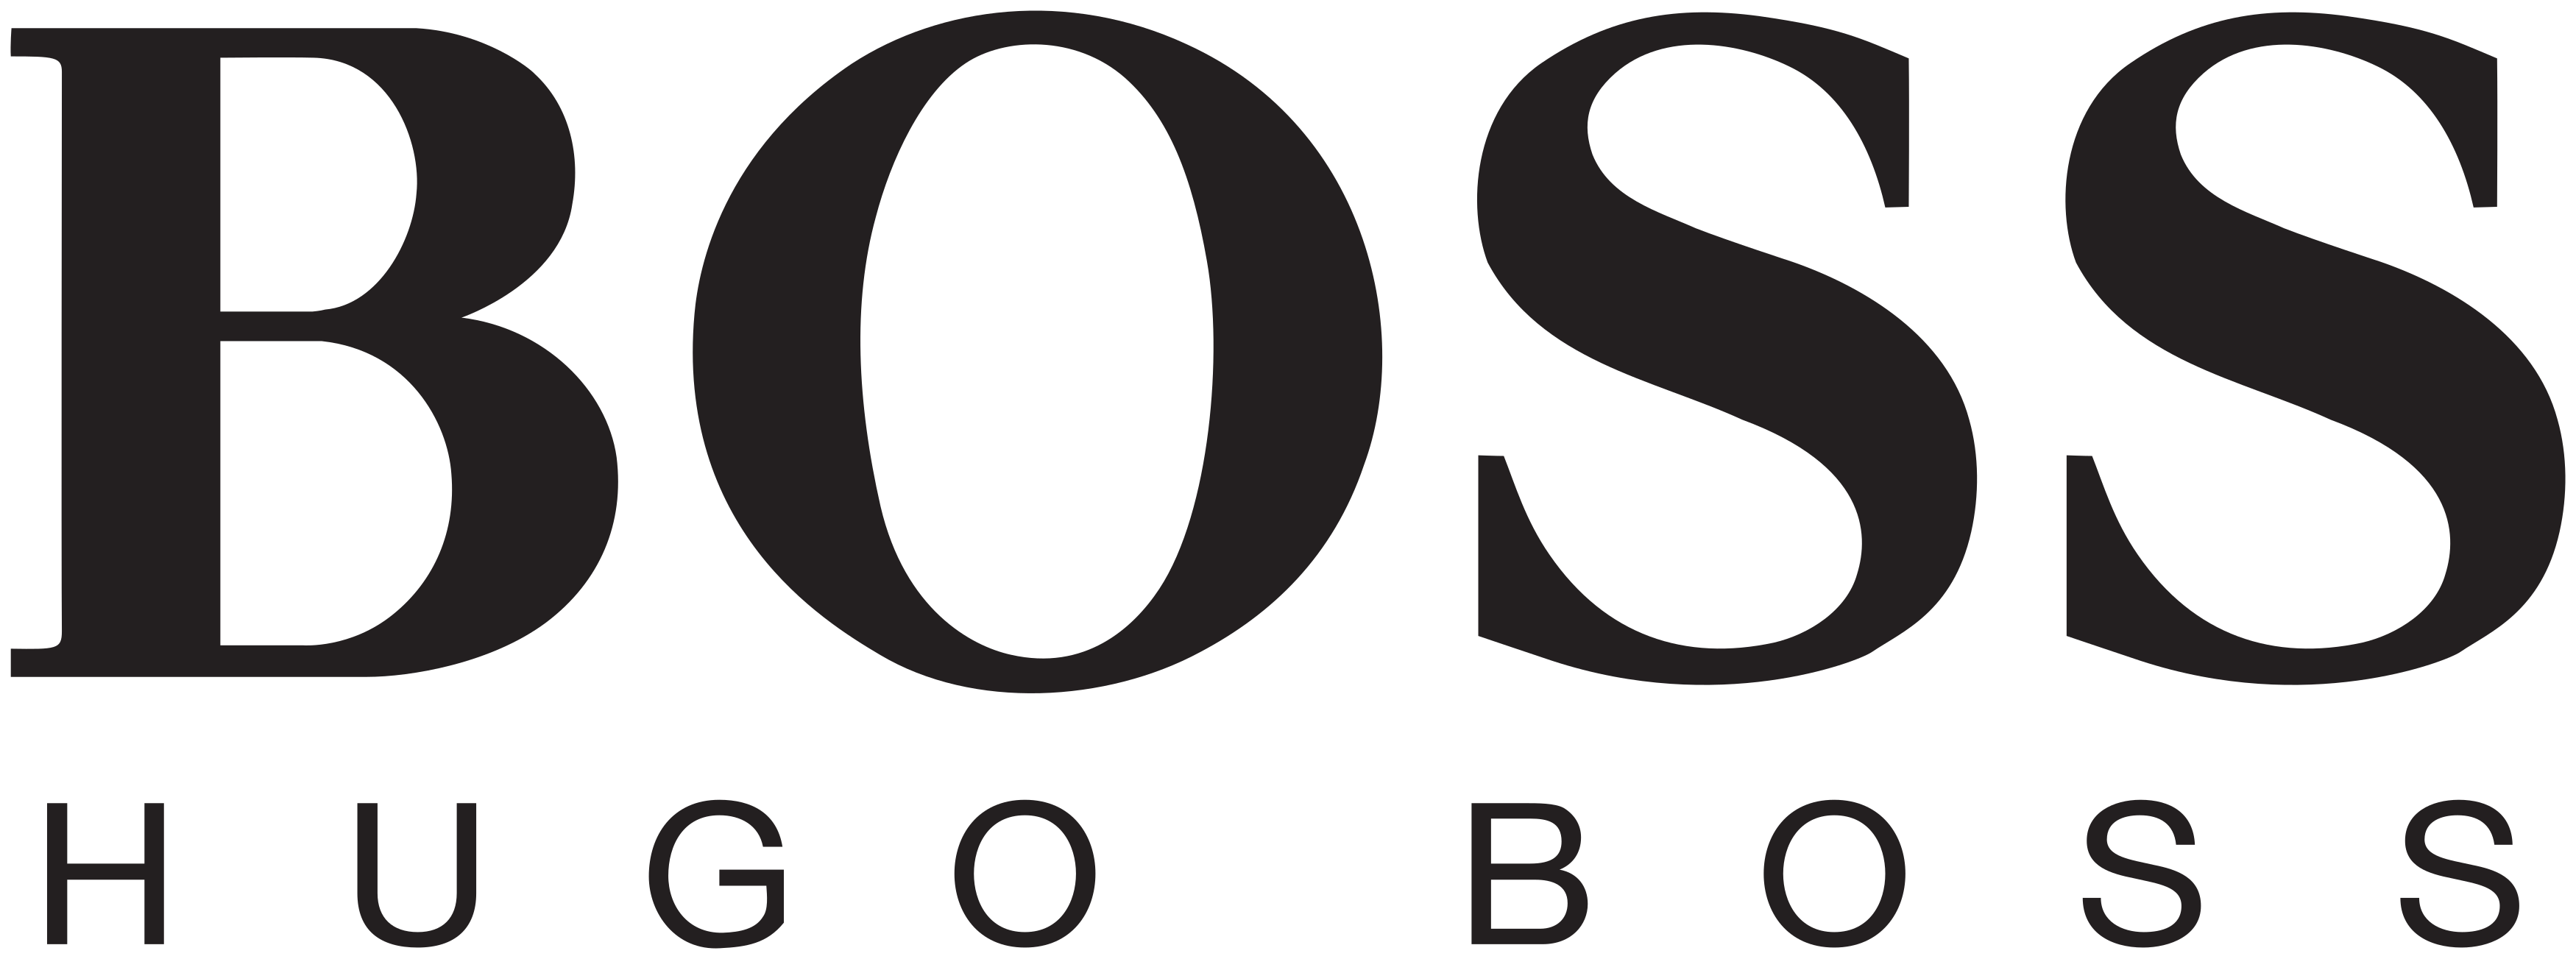 perfume hugo boss marca logo perfumer